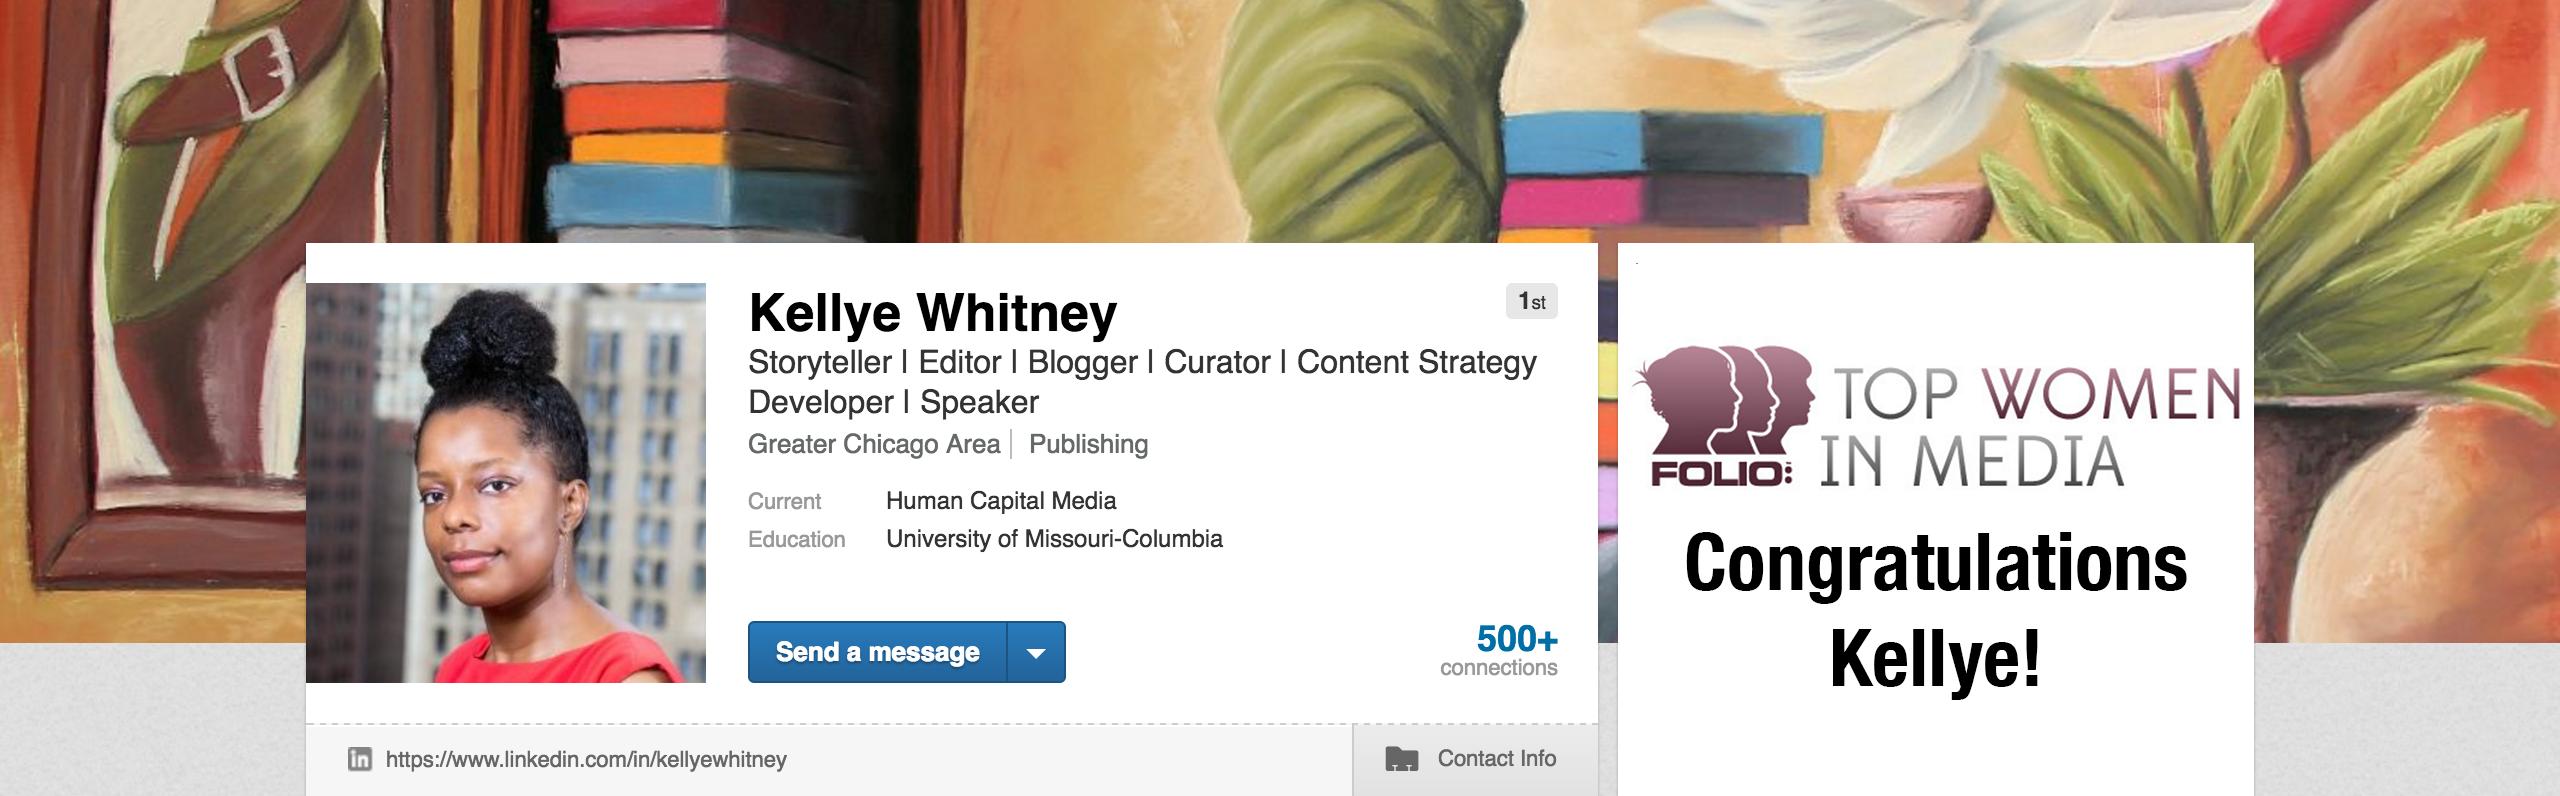 K_Whitney_LinkedIn.png